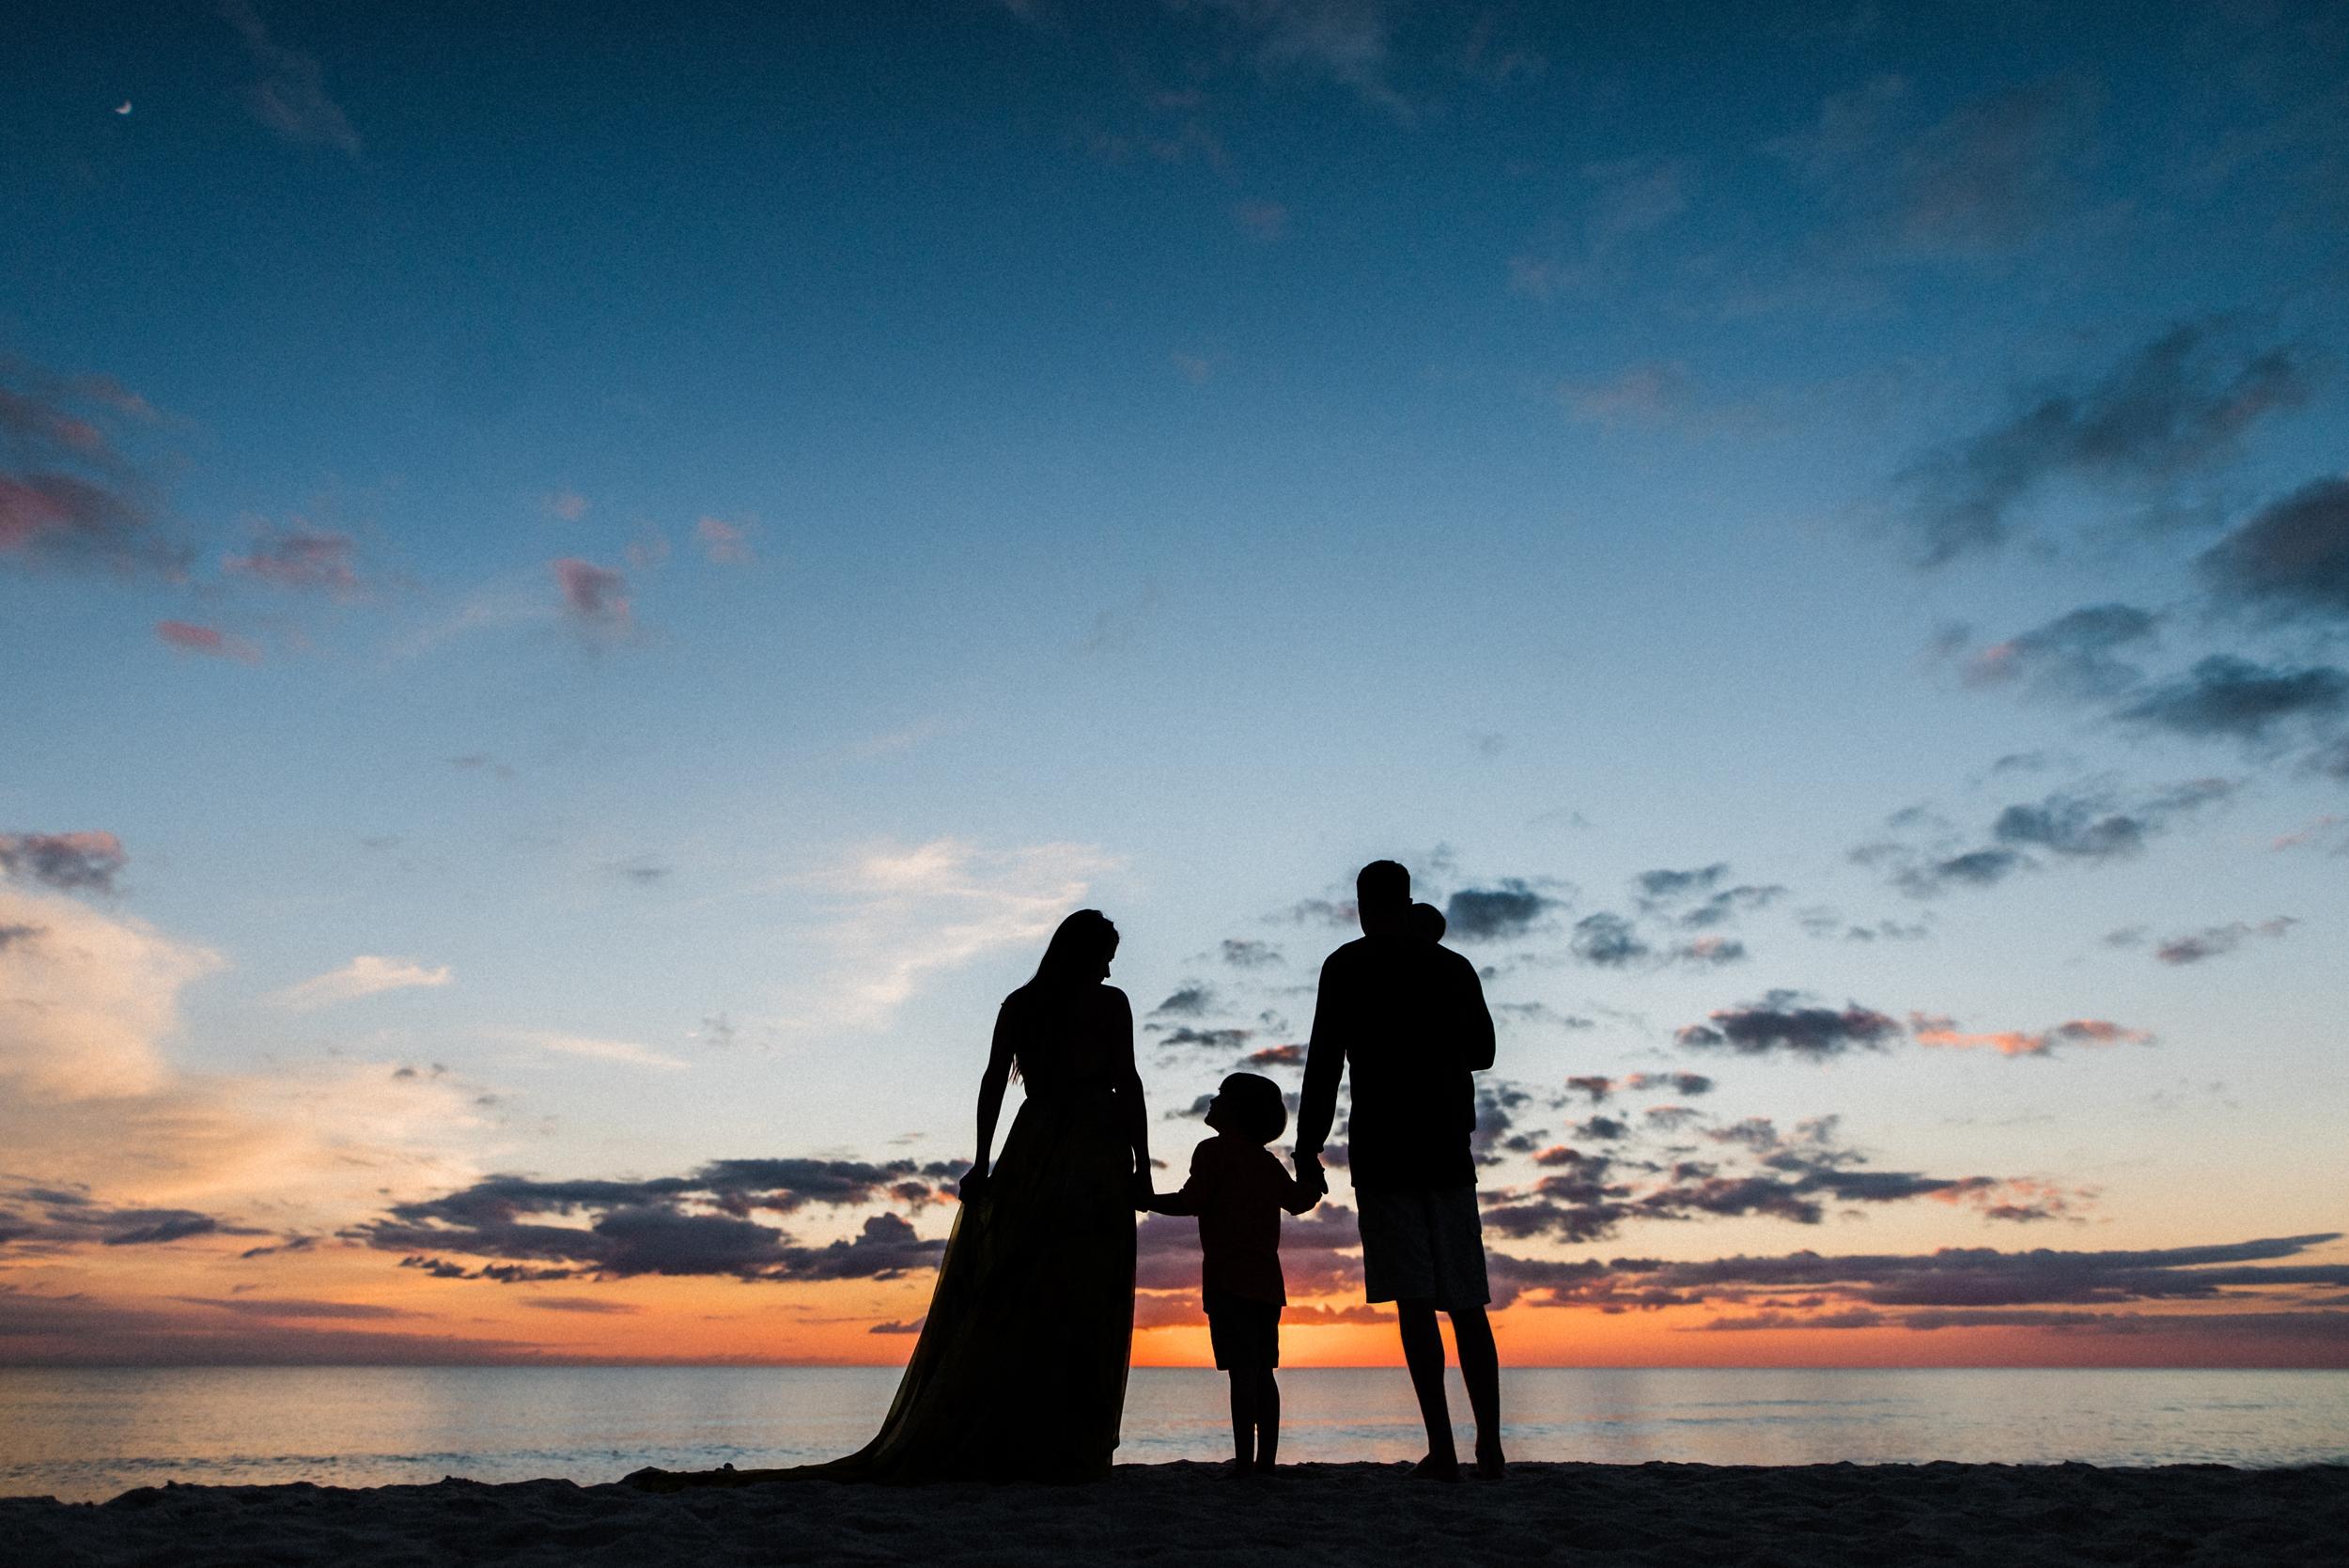 desiree-gardner-photography-pairs-france-monet-garden-monets-couple-wedding-engagement-giverny-30-a-30a-florida_0086.jpg